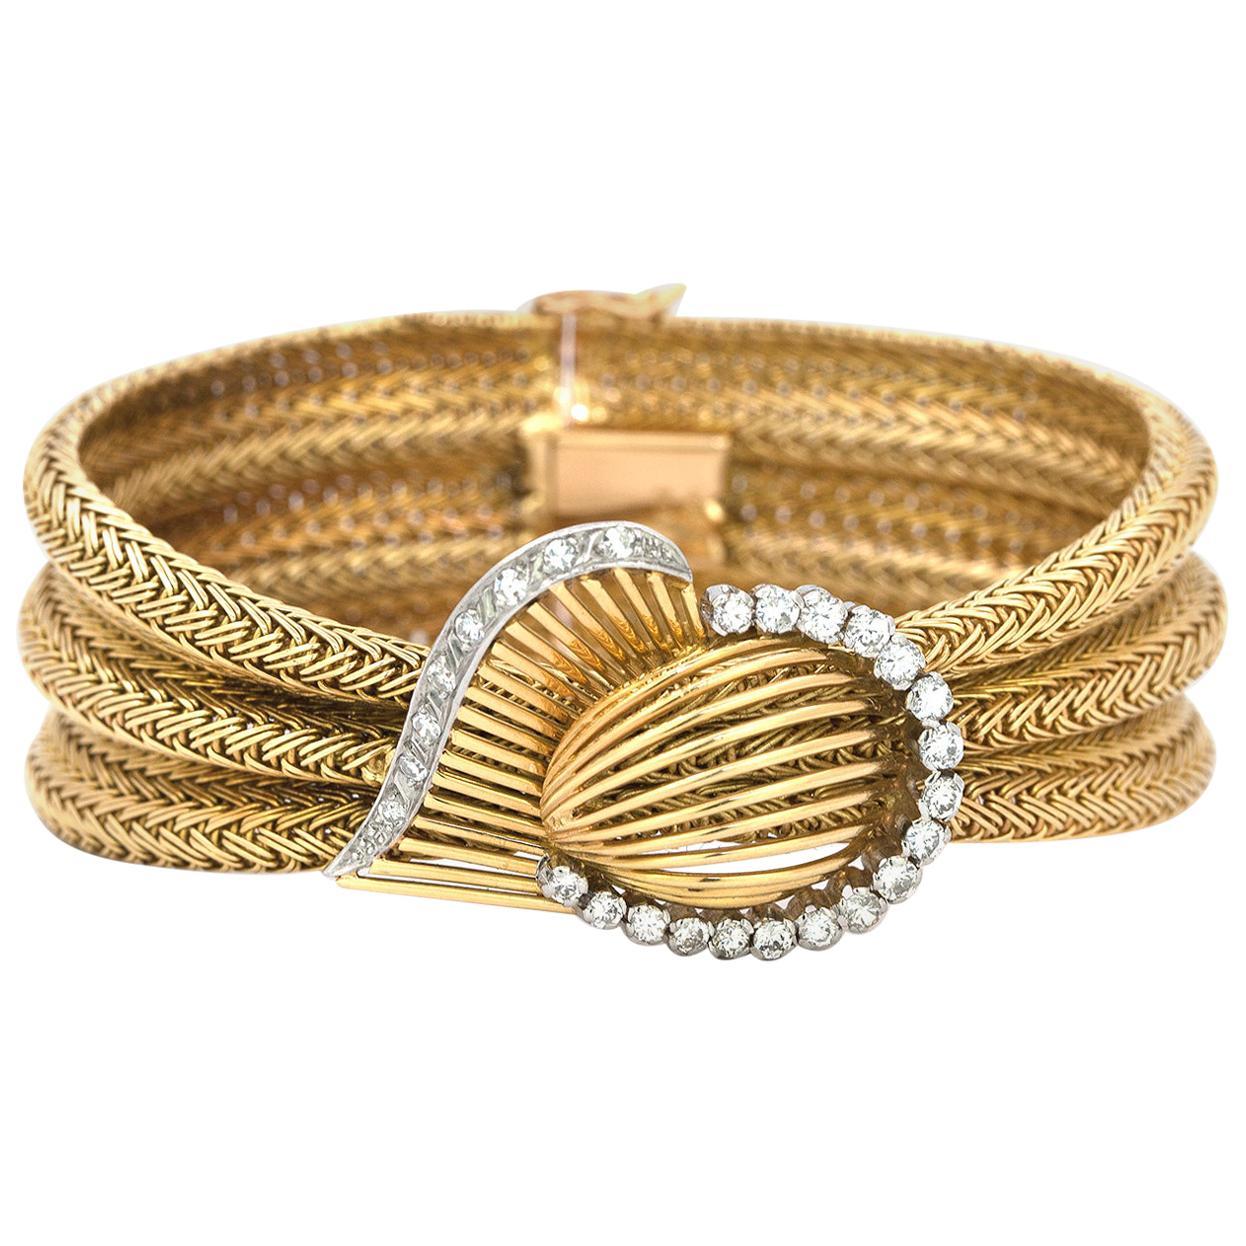 1970s 18 Karat Yellow Gold and Diamond Retro Mesh Cuff Bracelet